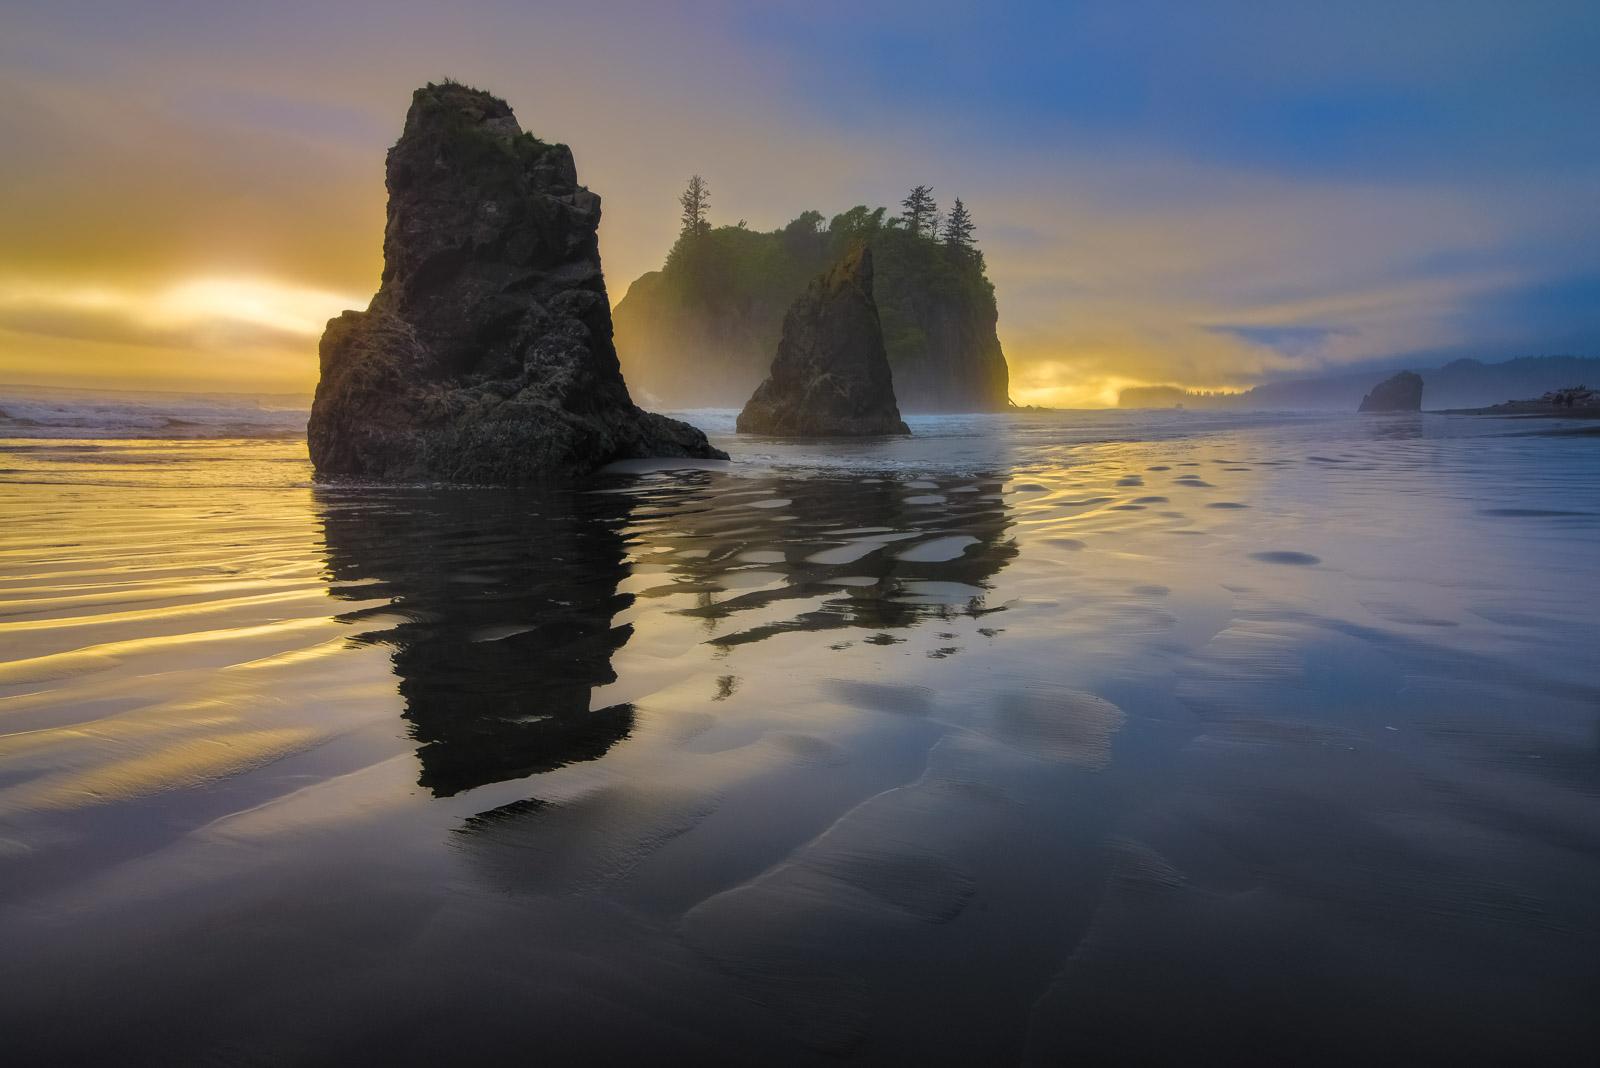 Sunset from Ruby Beach, Olympic National Park, Washington.